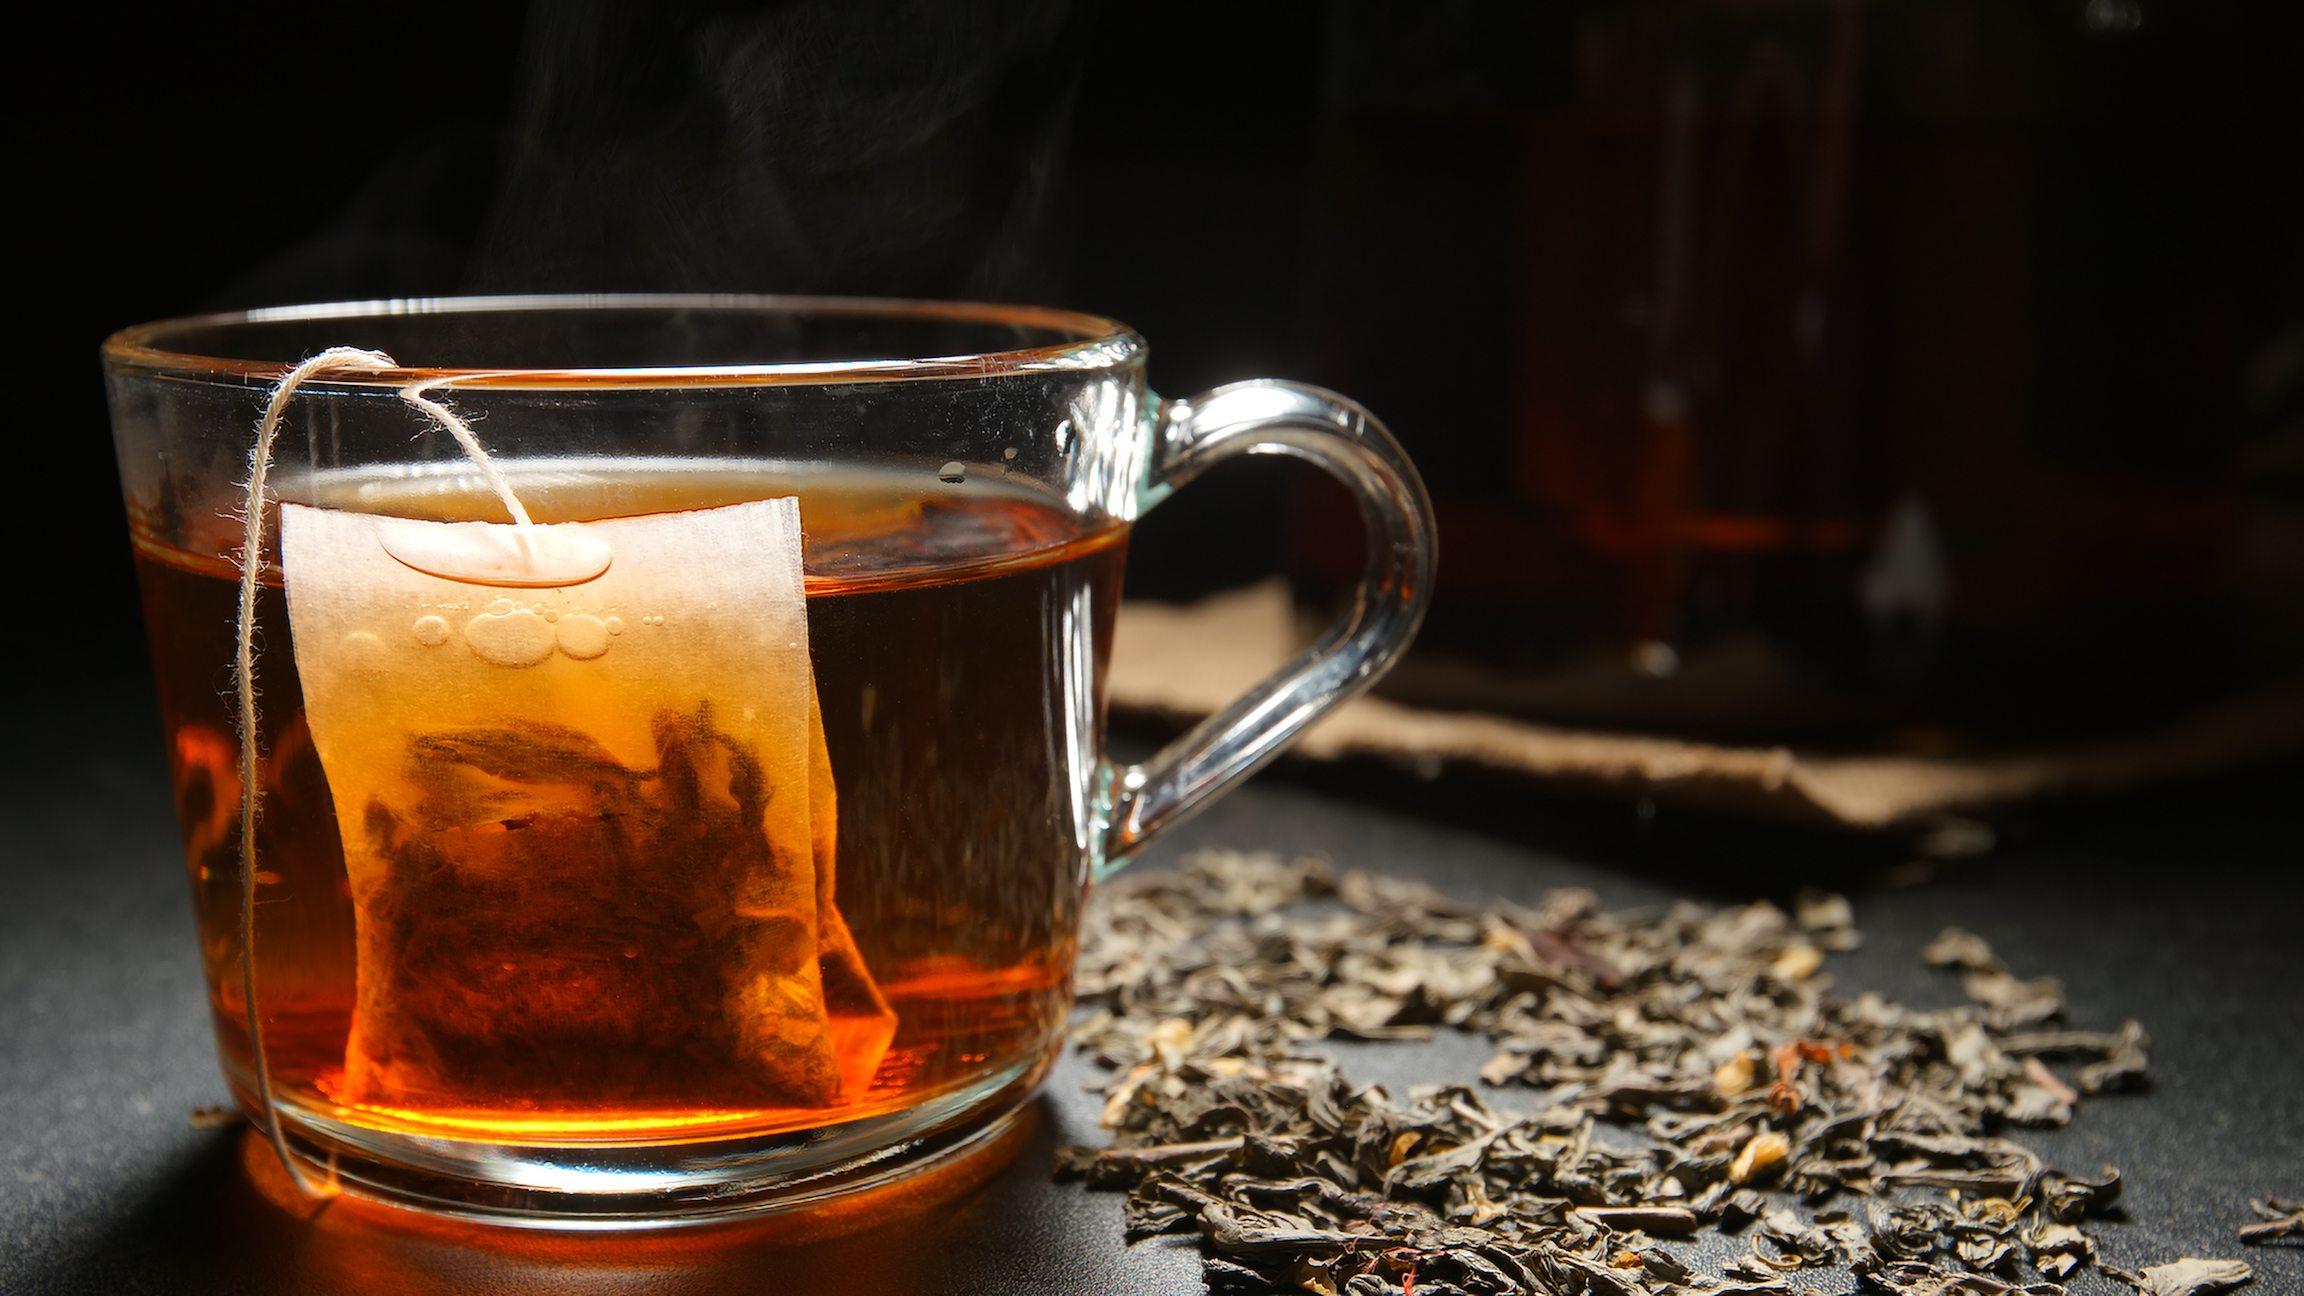 Tea bag in a hot tea cup on a table